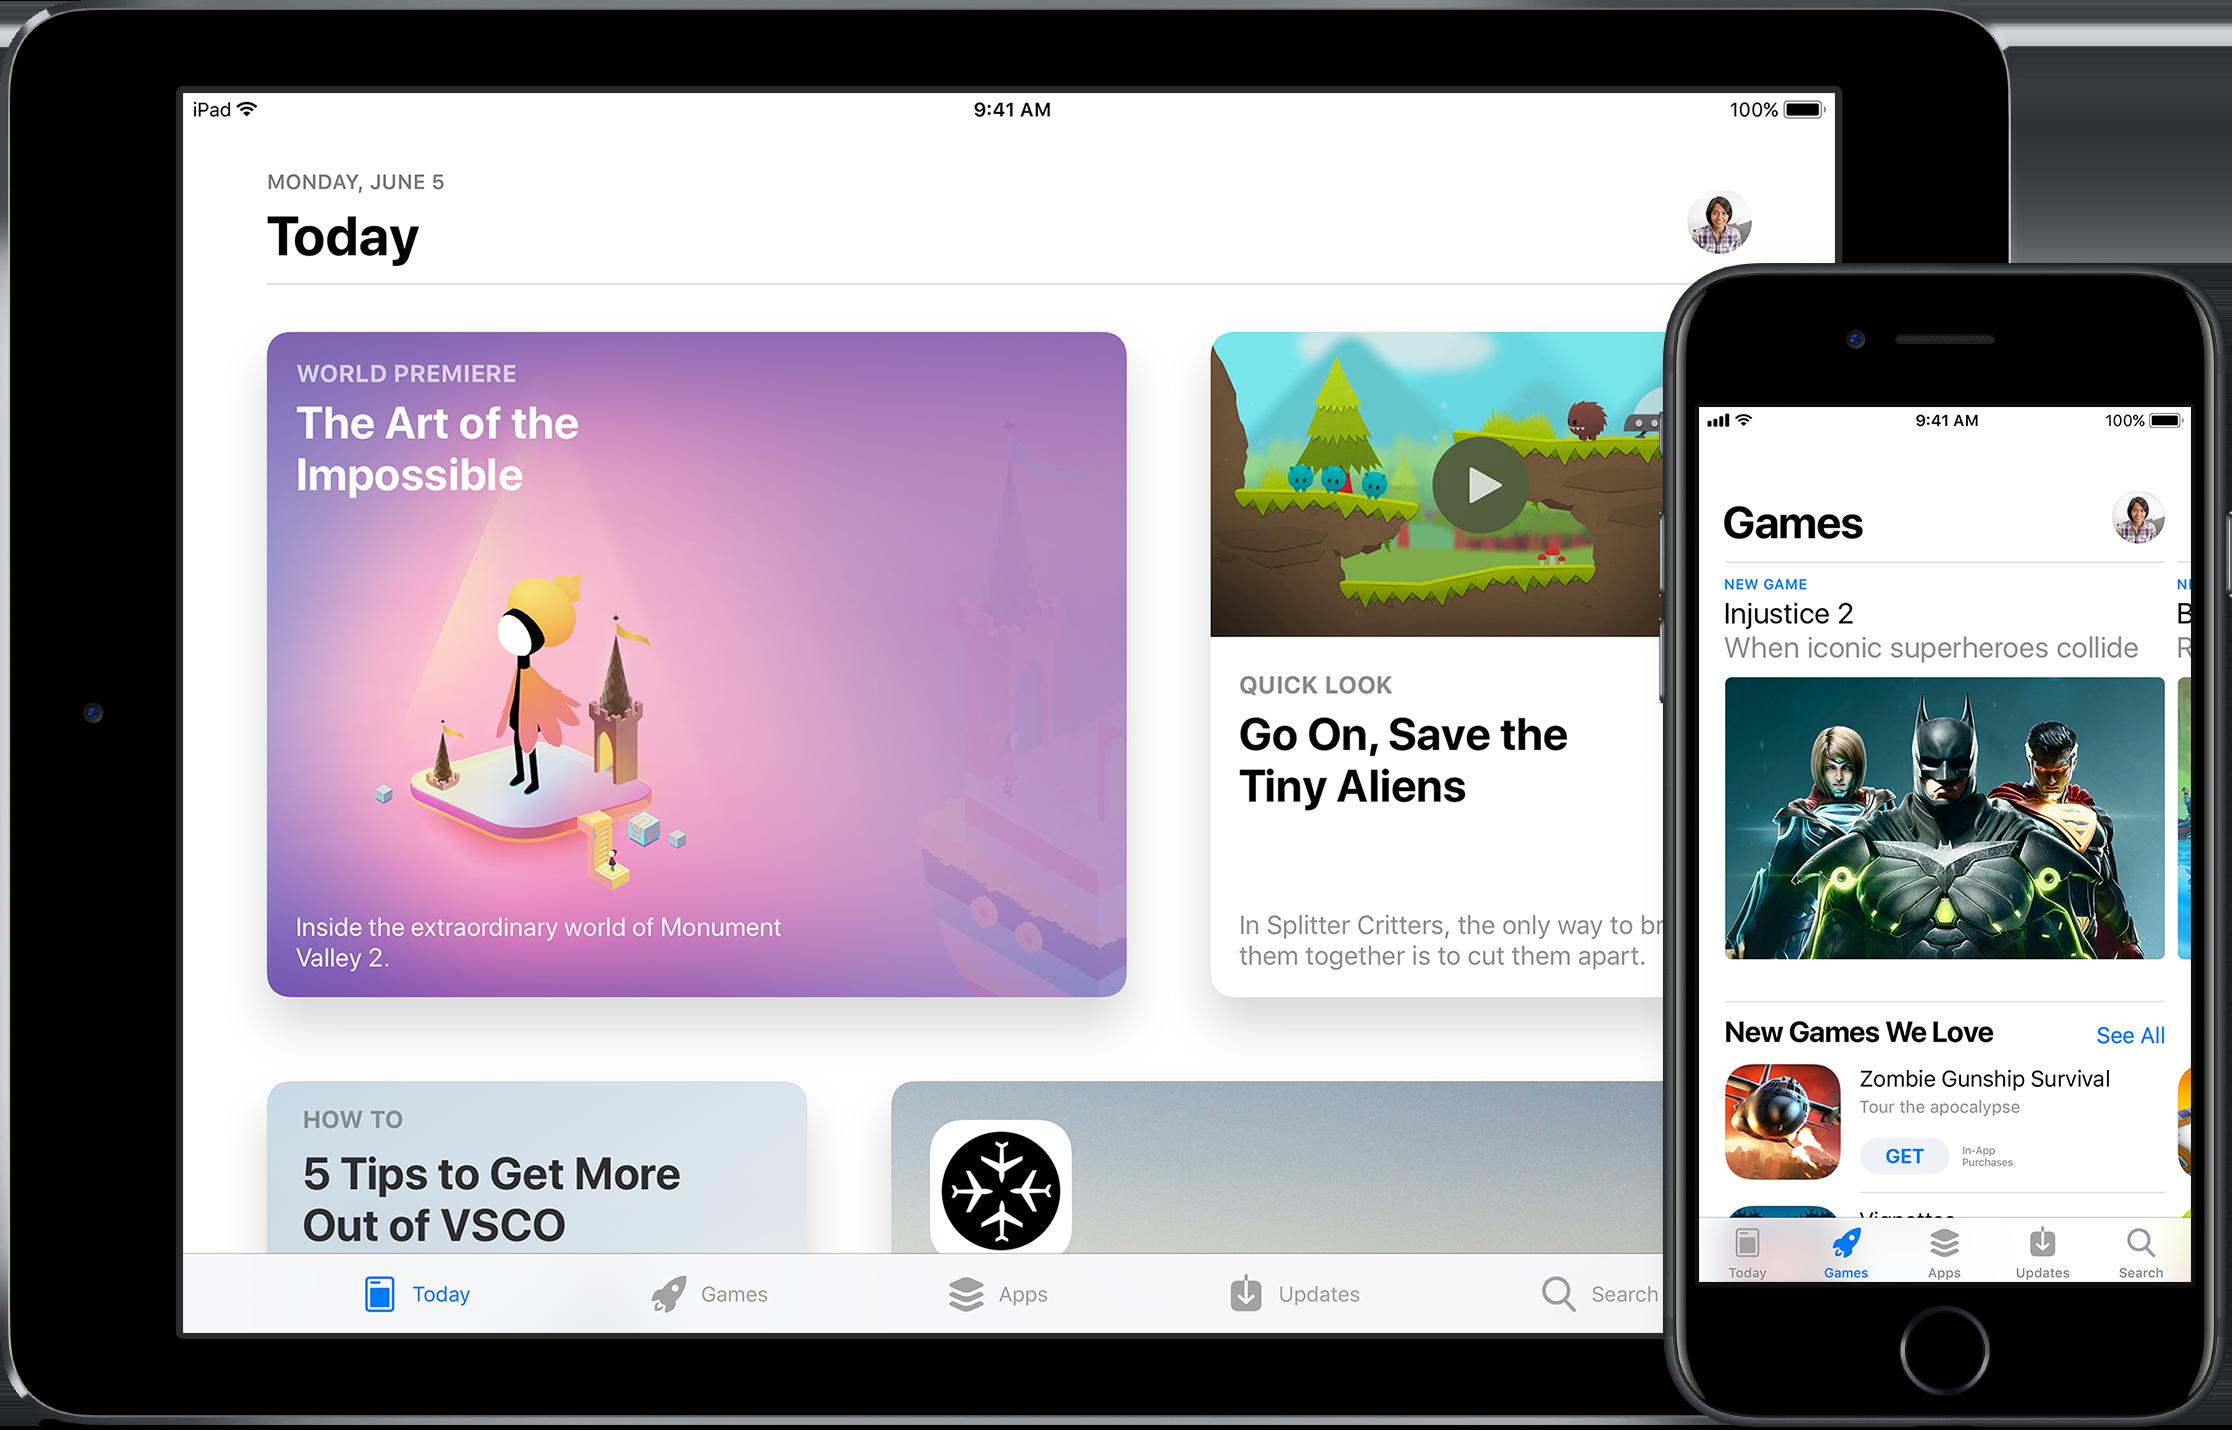 https://www.macfreak.nl/modules/news/images/zArt.NewAppStore-iPadEn-iPhone.png